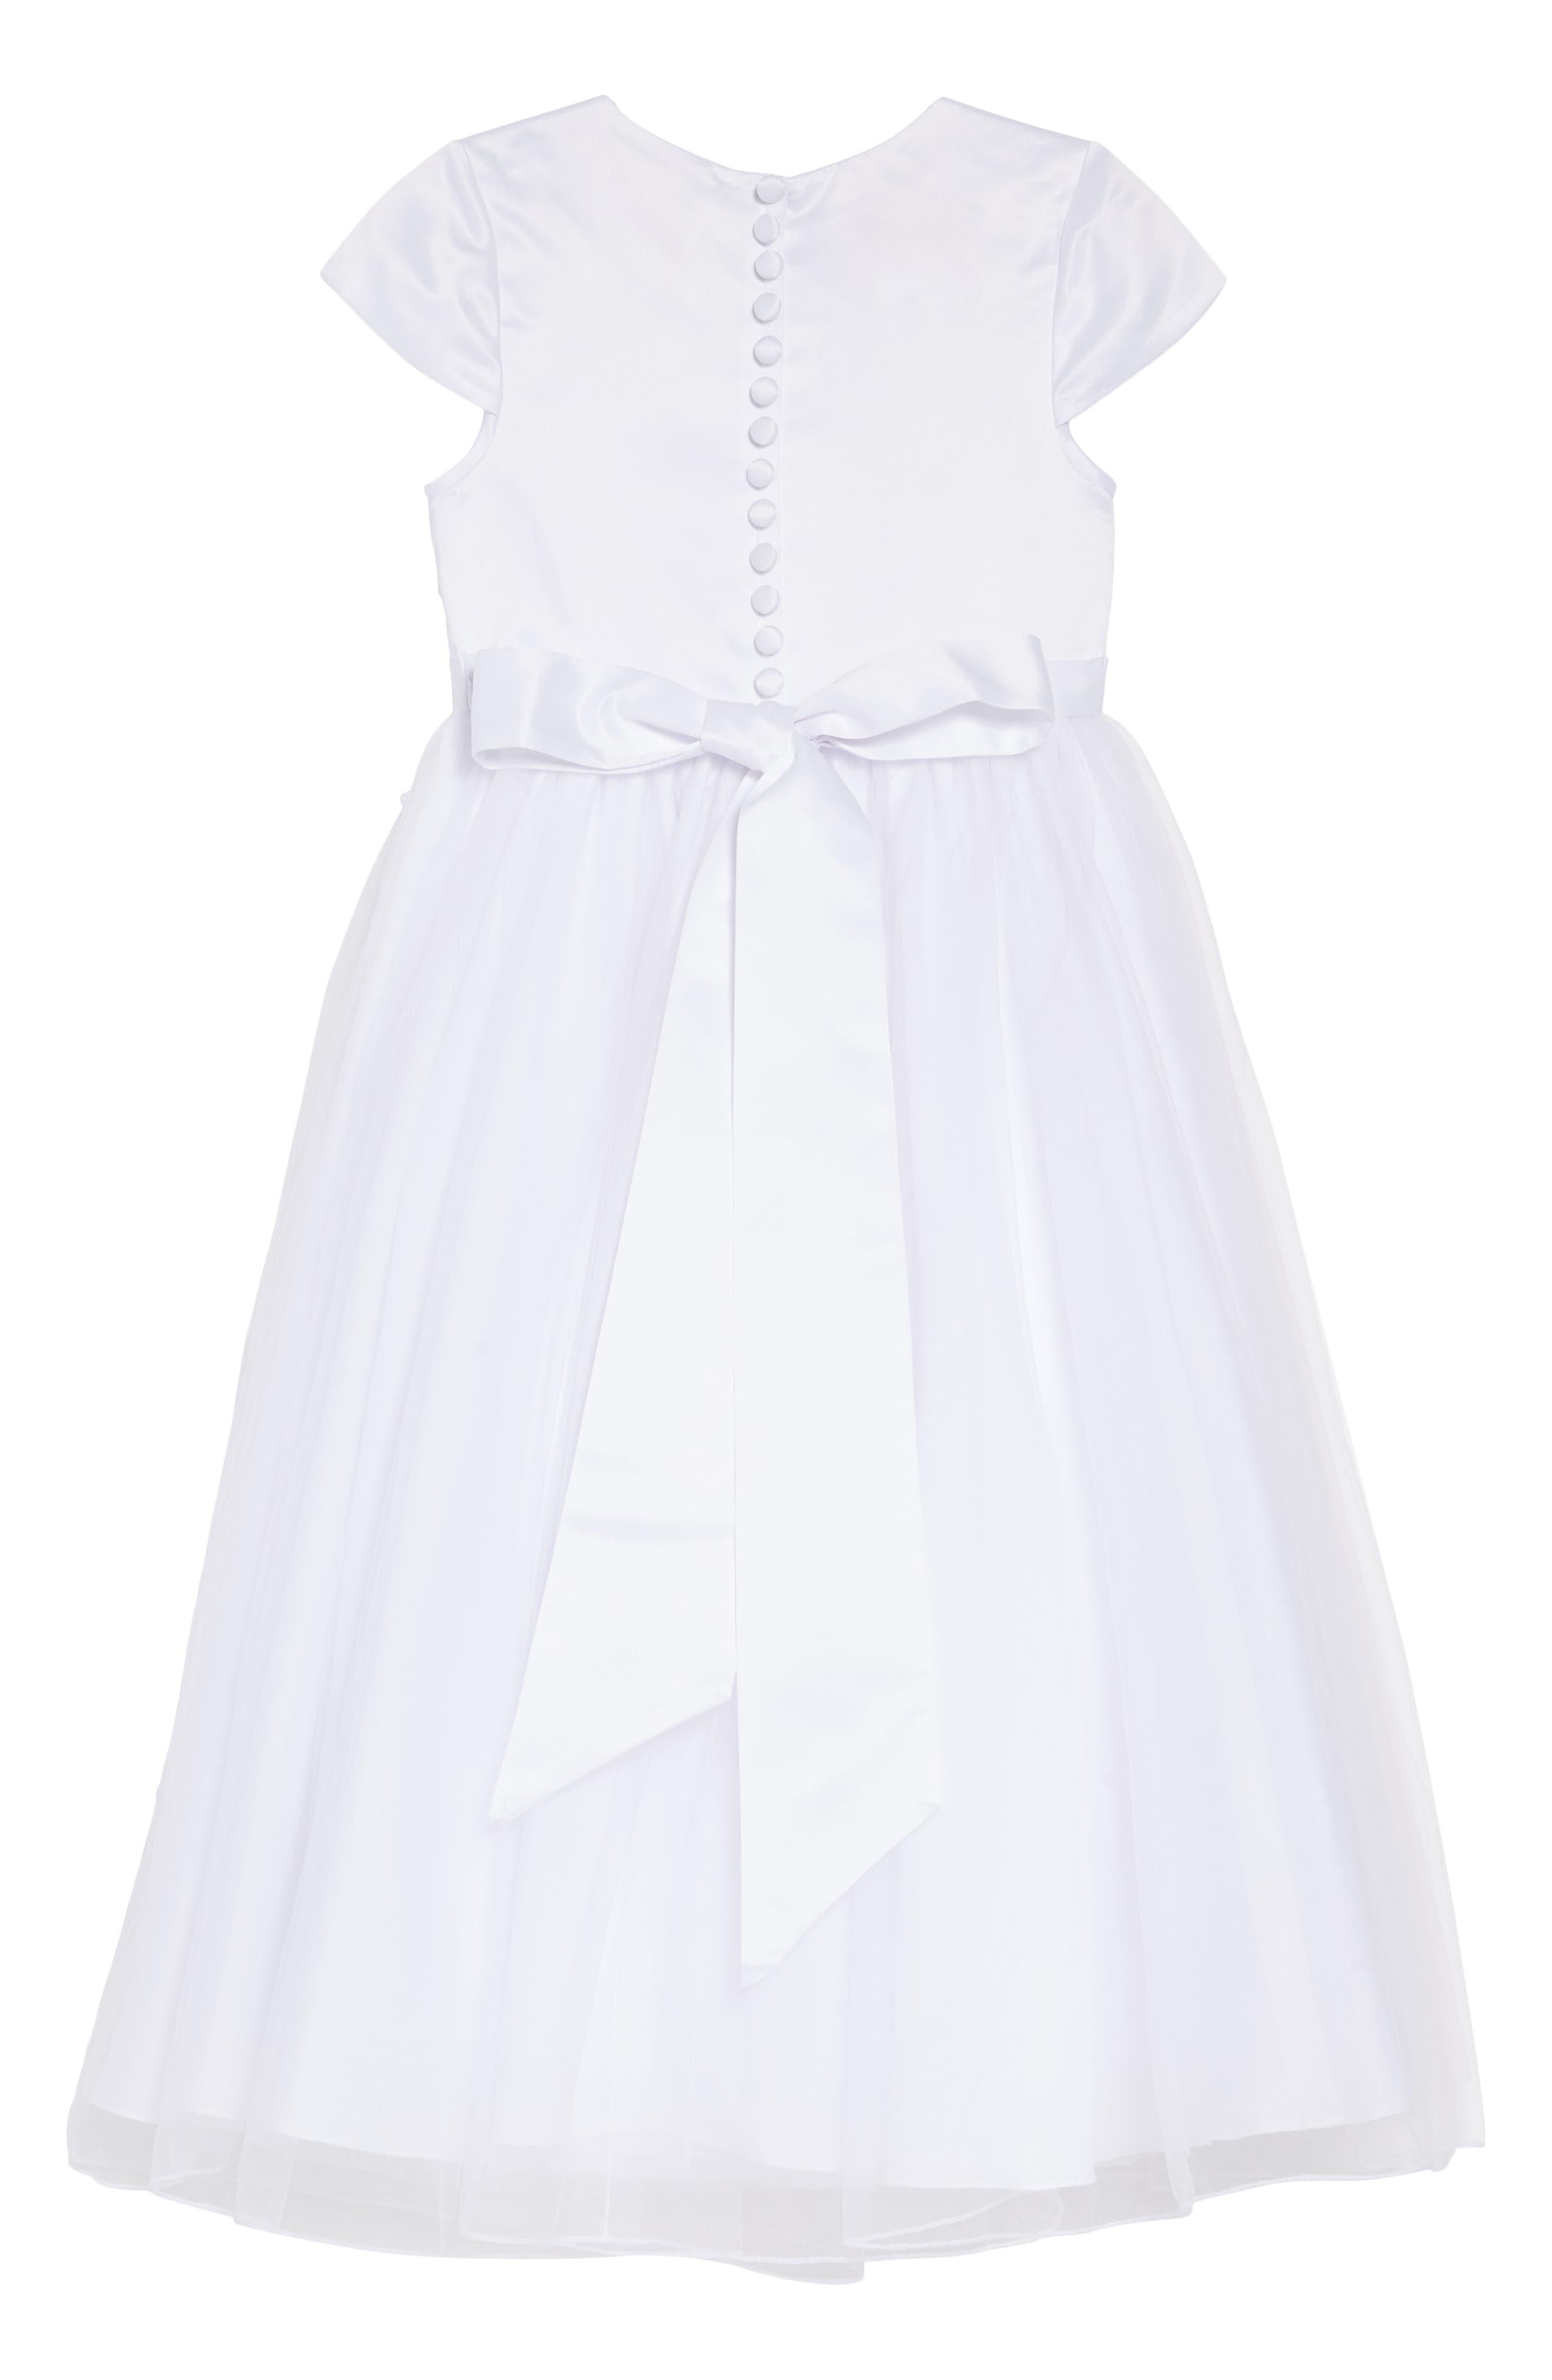 LAUREN MARIE,                             Beaded Lace First Communion Dress,                             Alternate thumbnail 4, color,                             WHITE